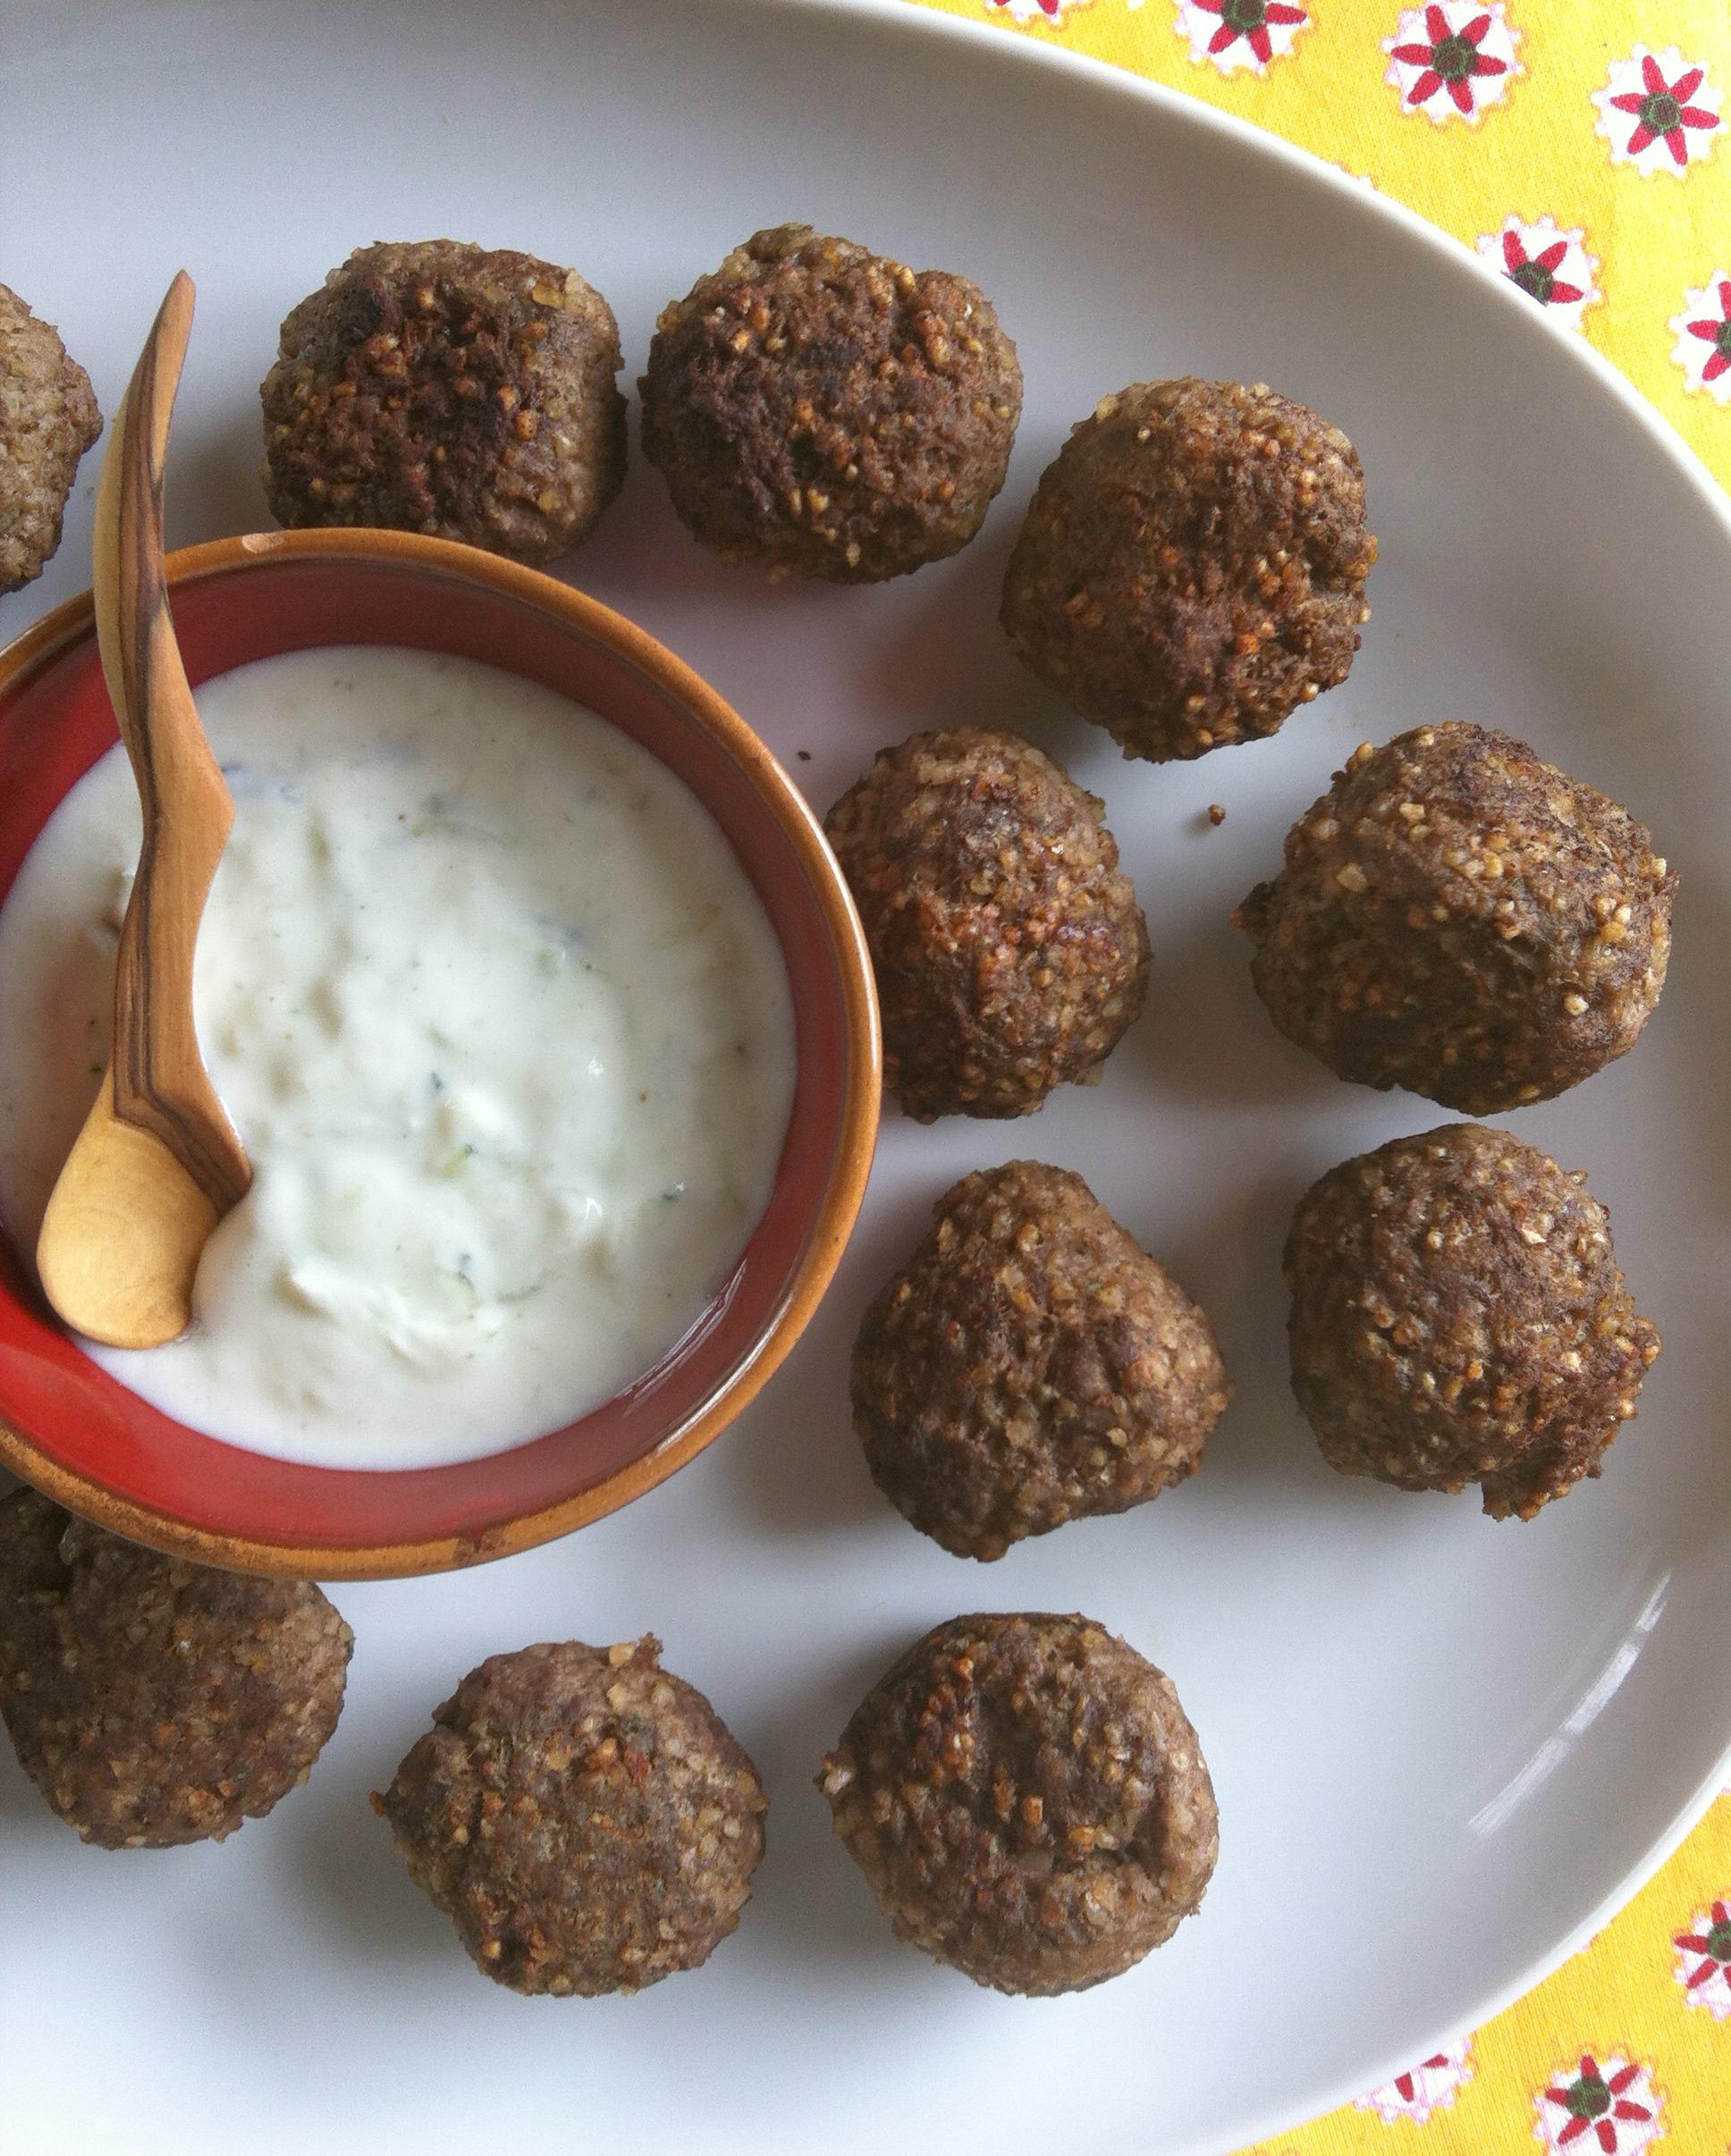 Meatballs - Kibbeh Meatballs With Spiced Yogurt Sauce